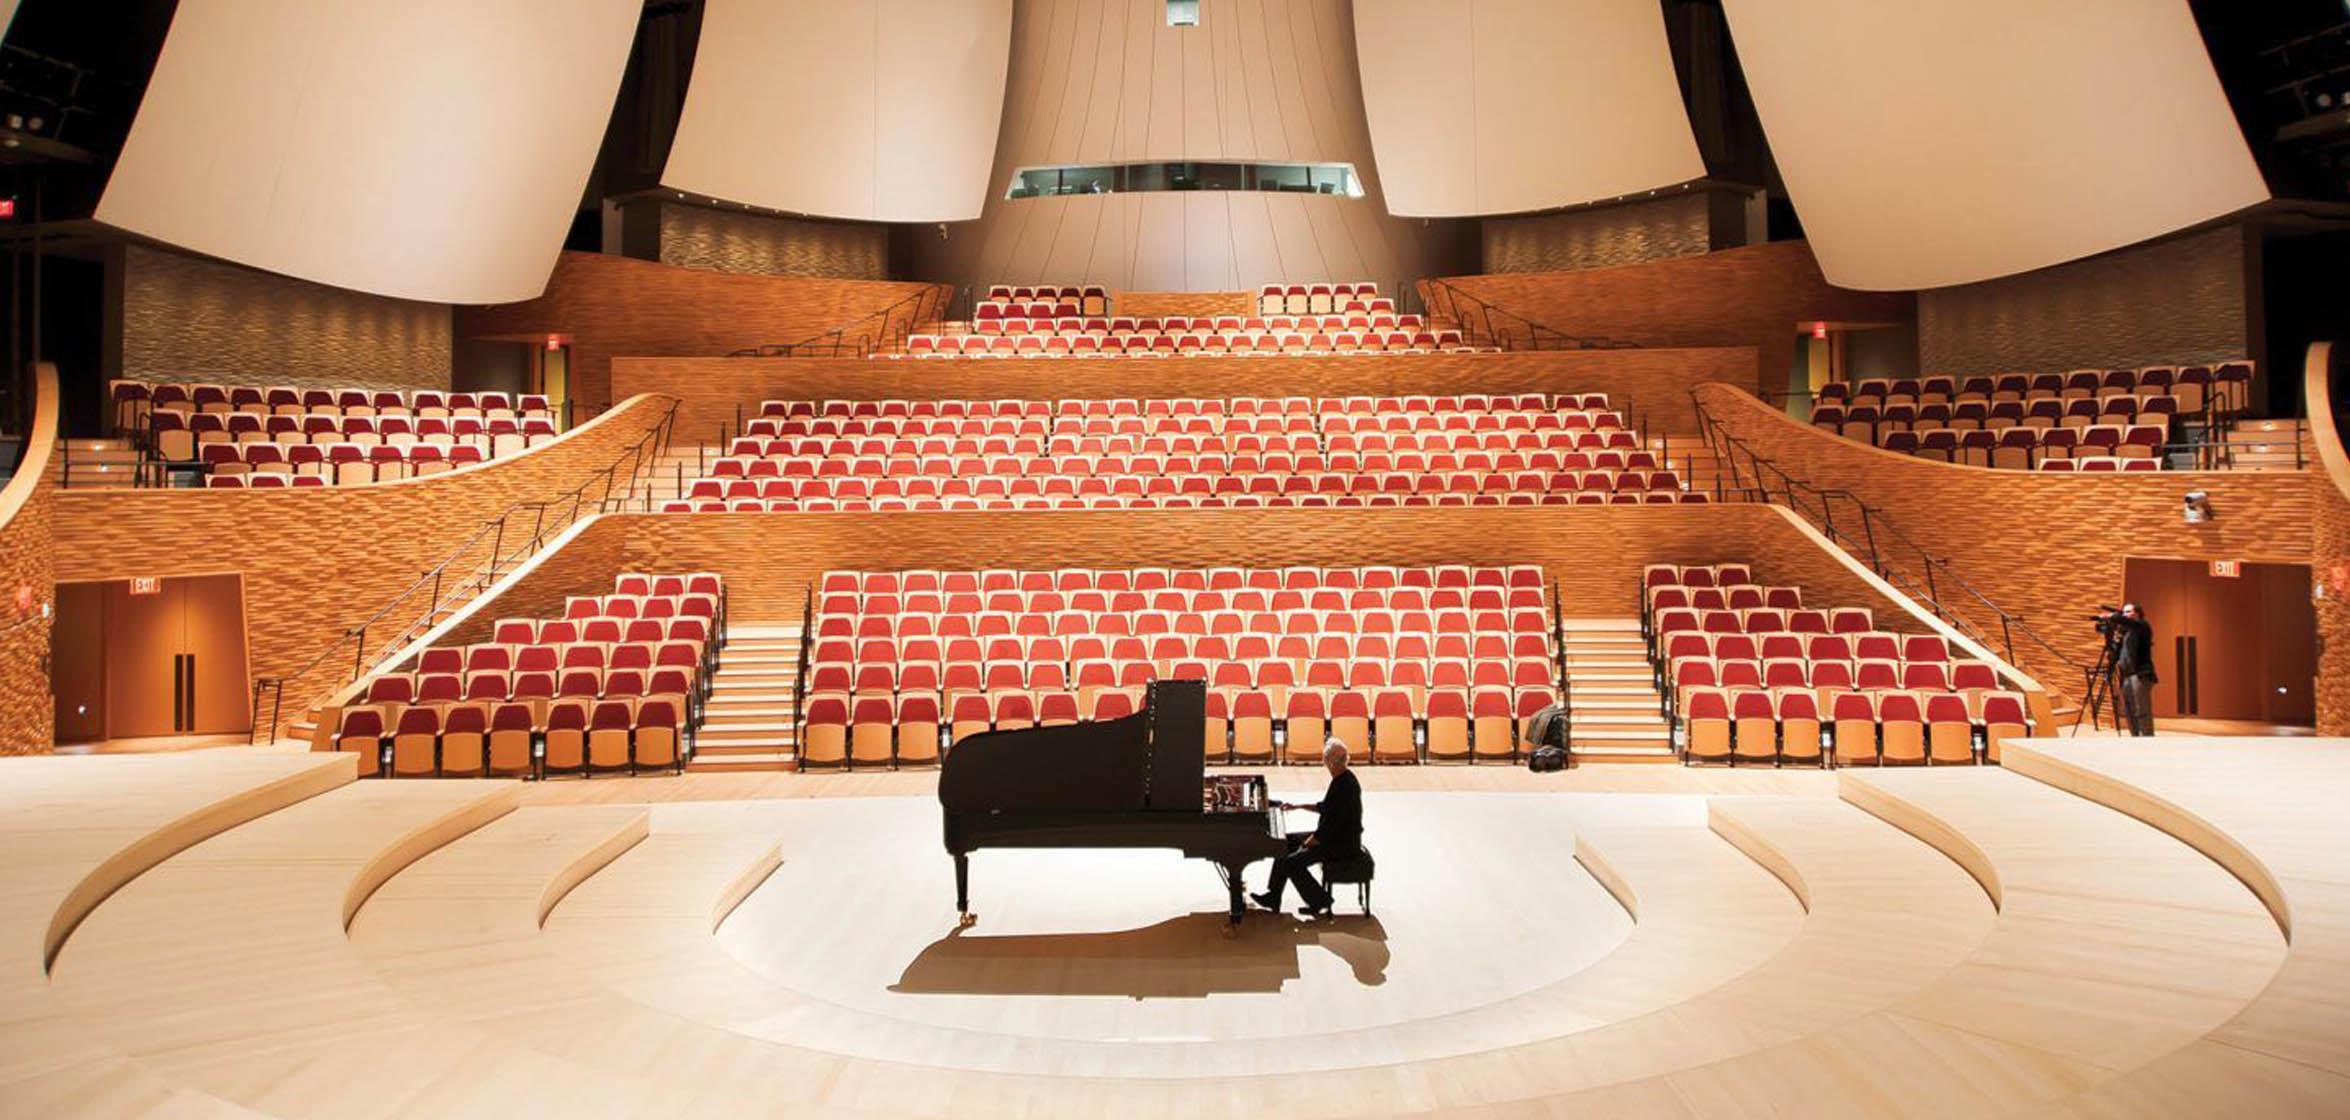 Image result for Concert hall